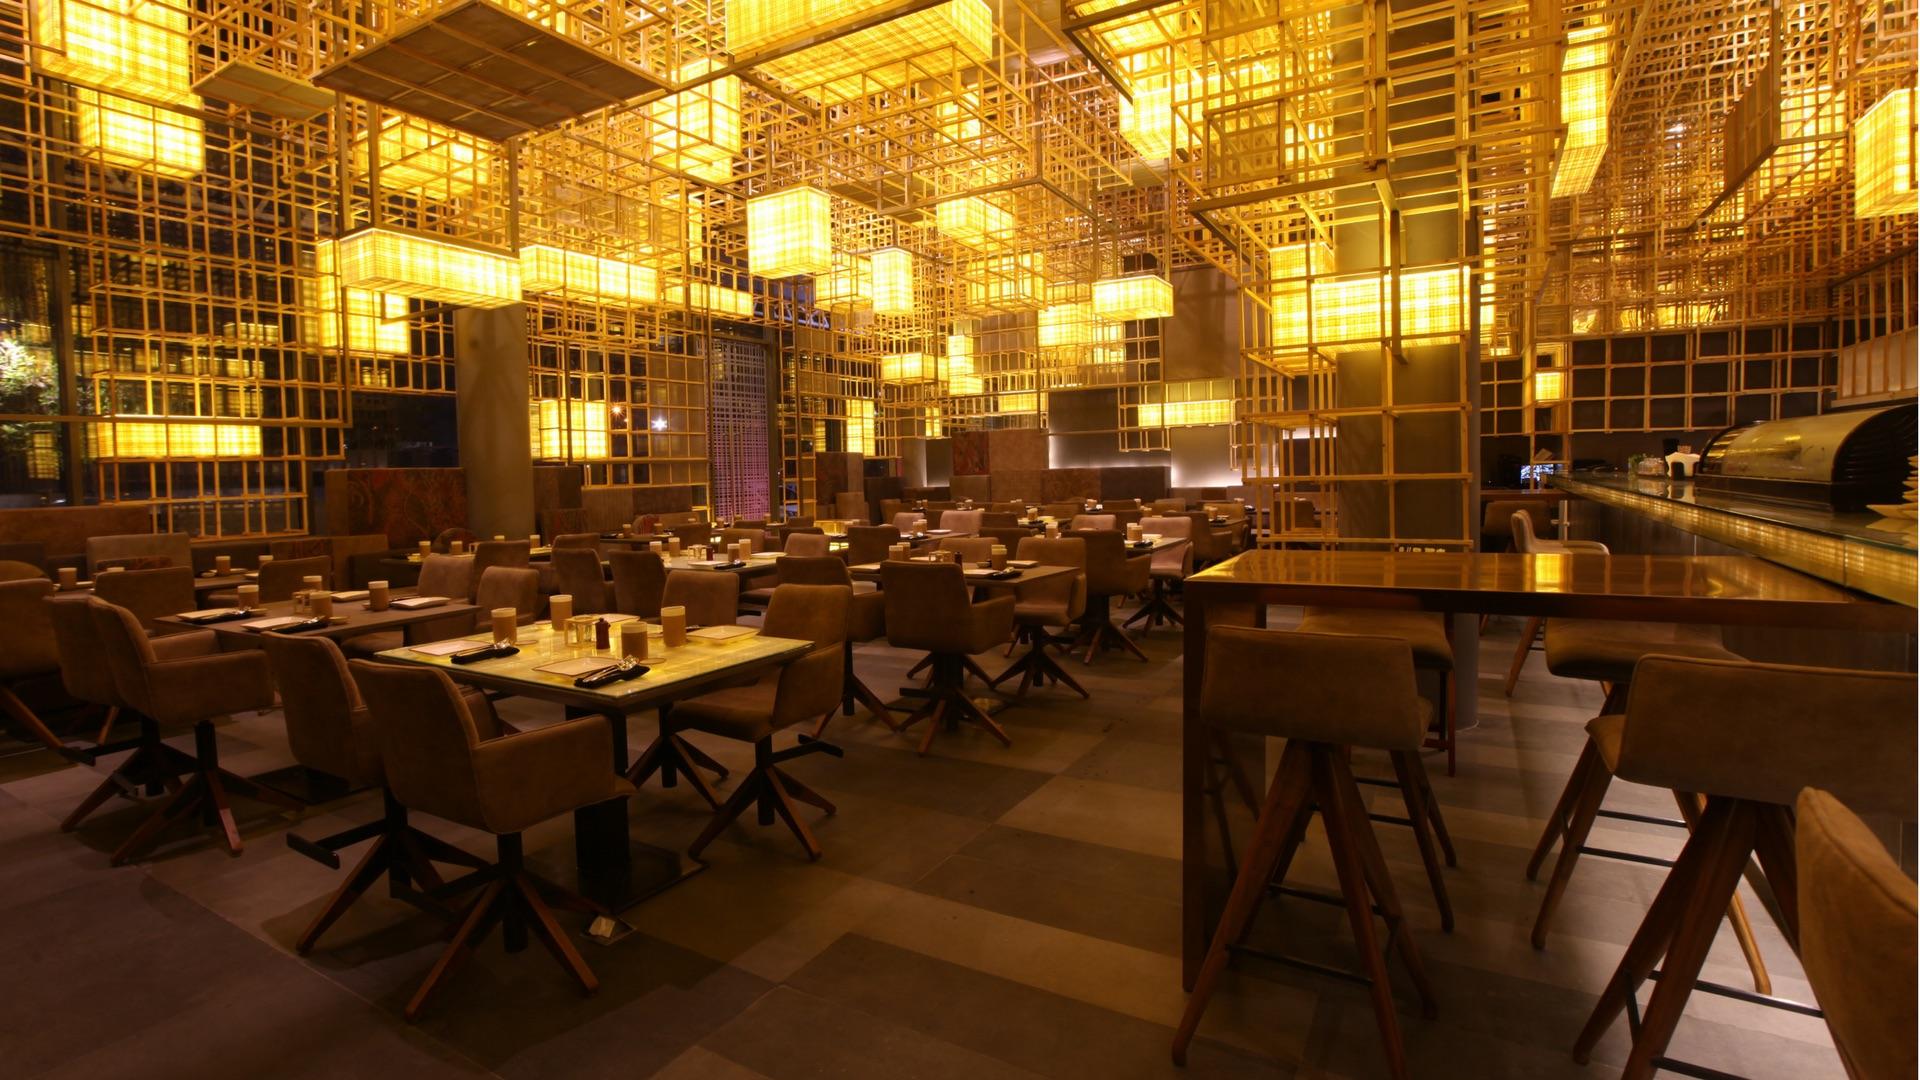 Best Kitchen Gallery: Pan Asian Restaurant Gong's Interior Design Offers A Lesson In of Restaurant Interior Design on rachelxblog.com